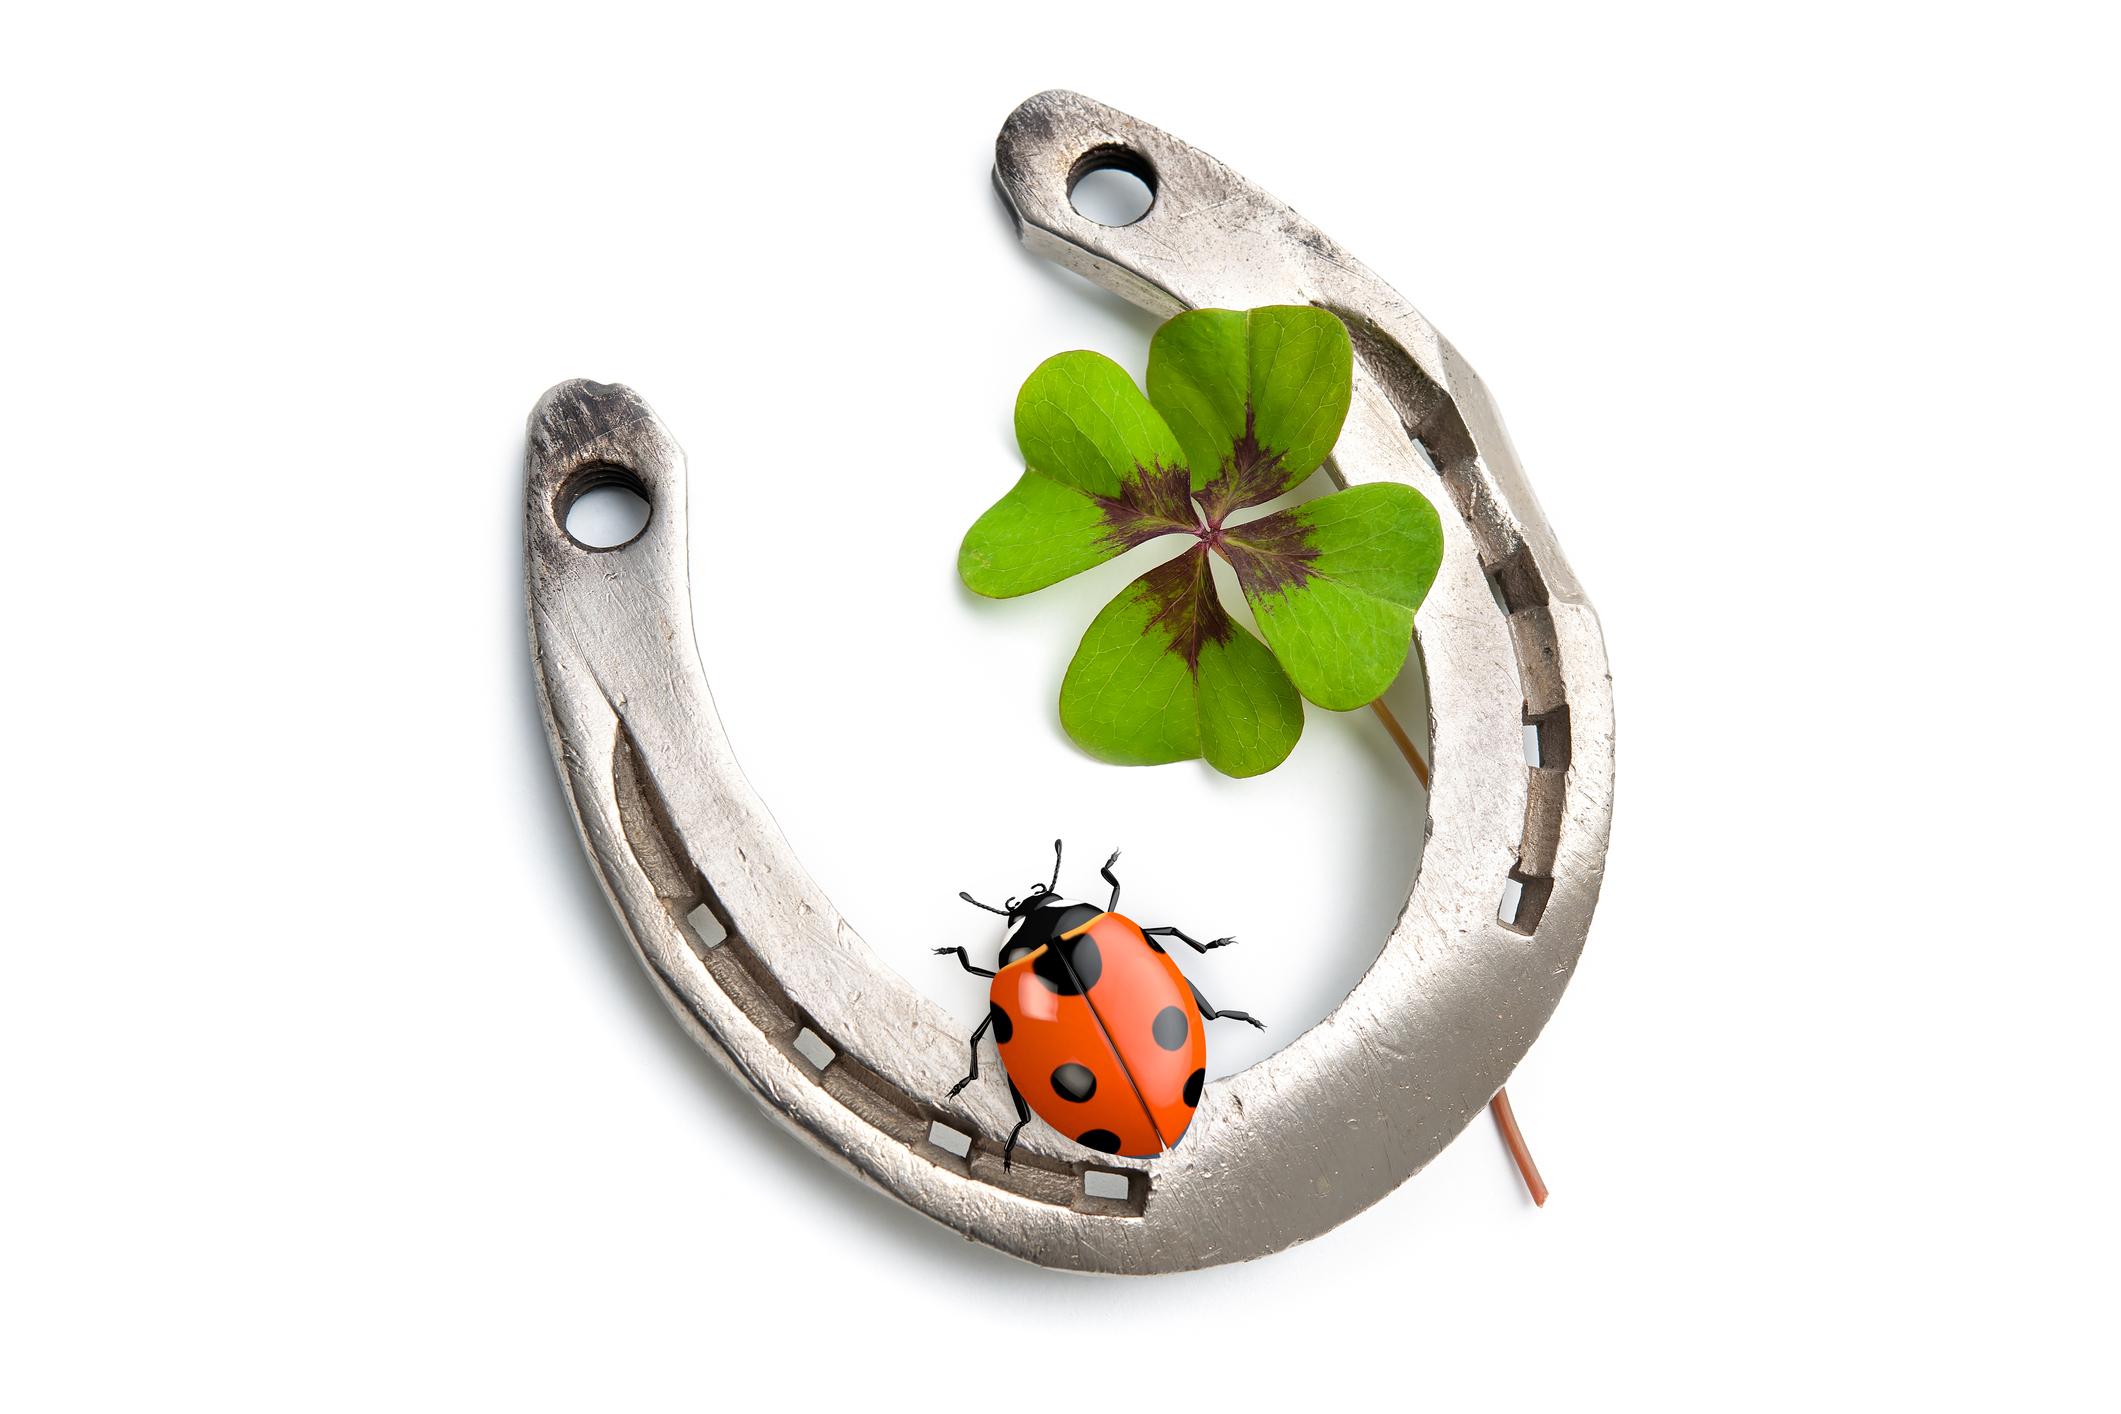 Lucky horseshoe holding a ladybug and a four-leaf clover.